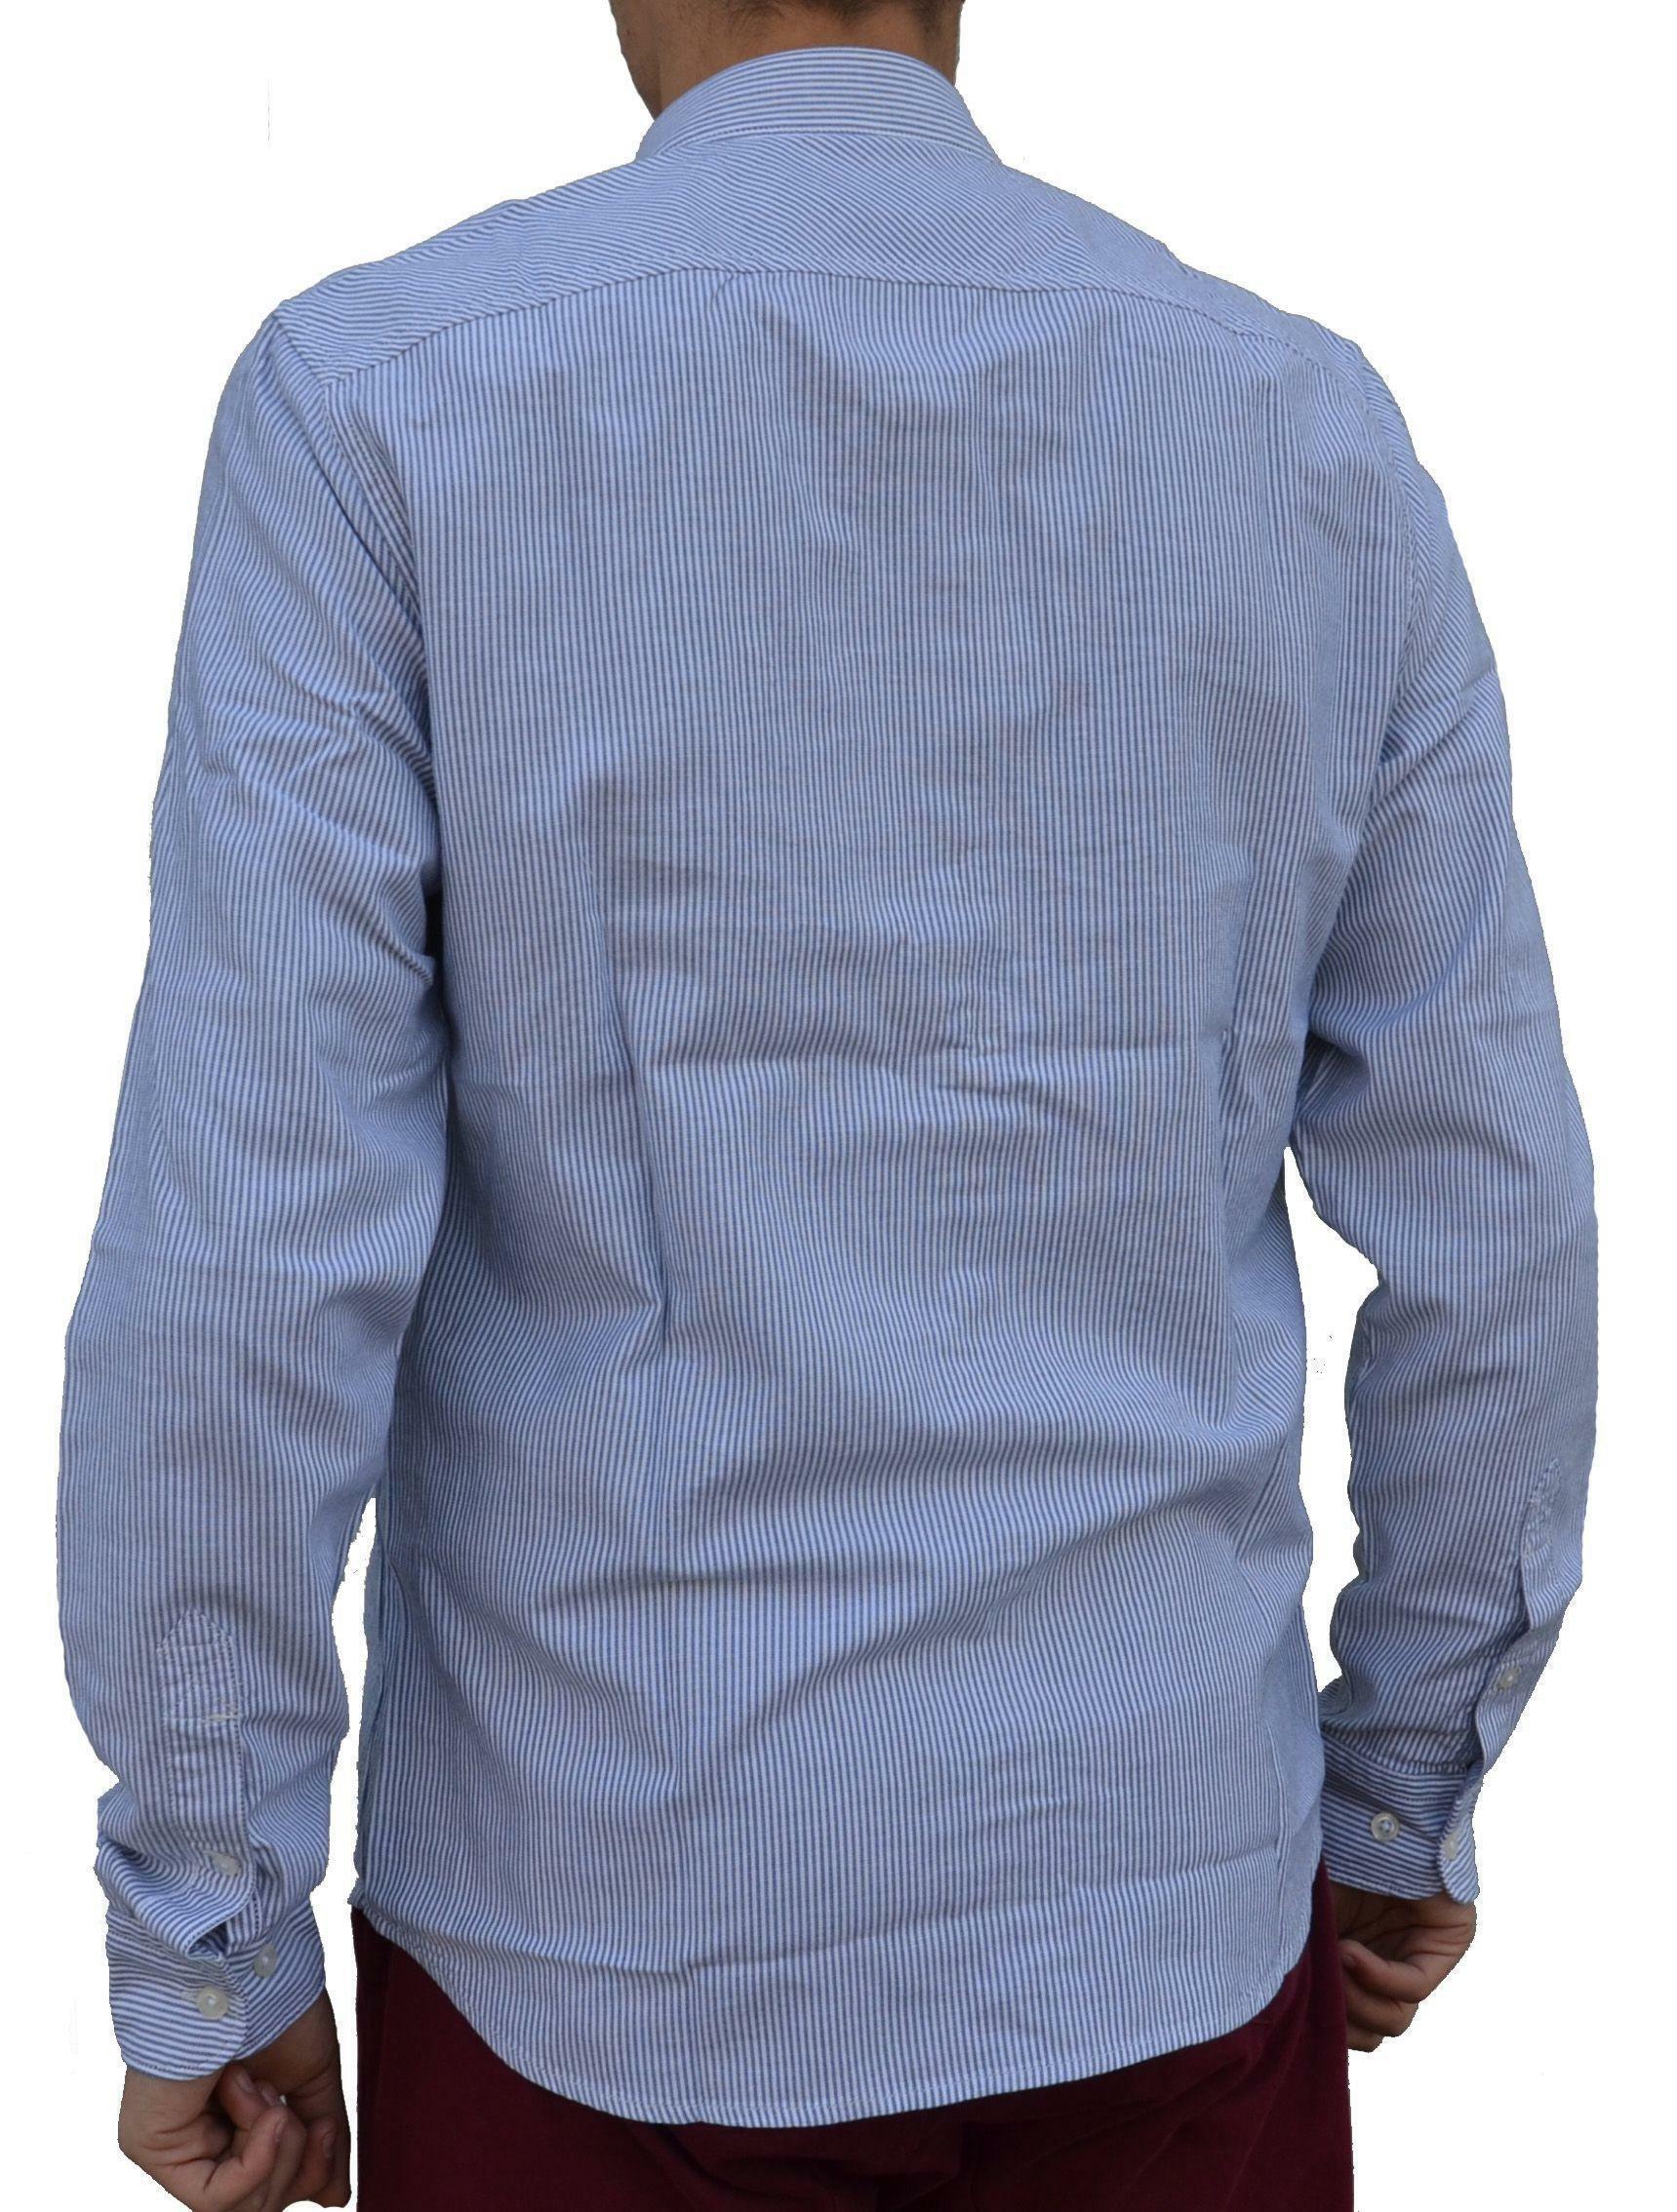 timberland timberland ls rattle river camicia uomo bianca blu